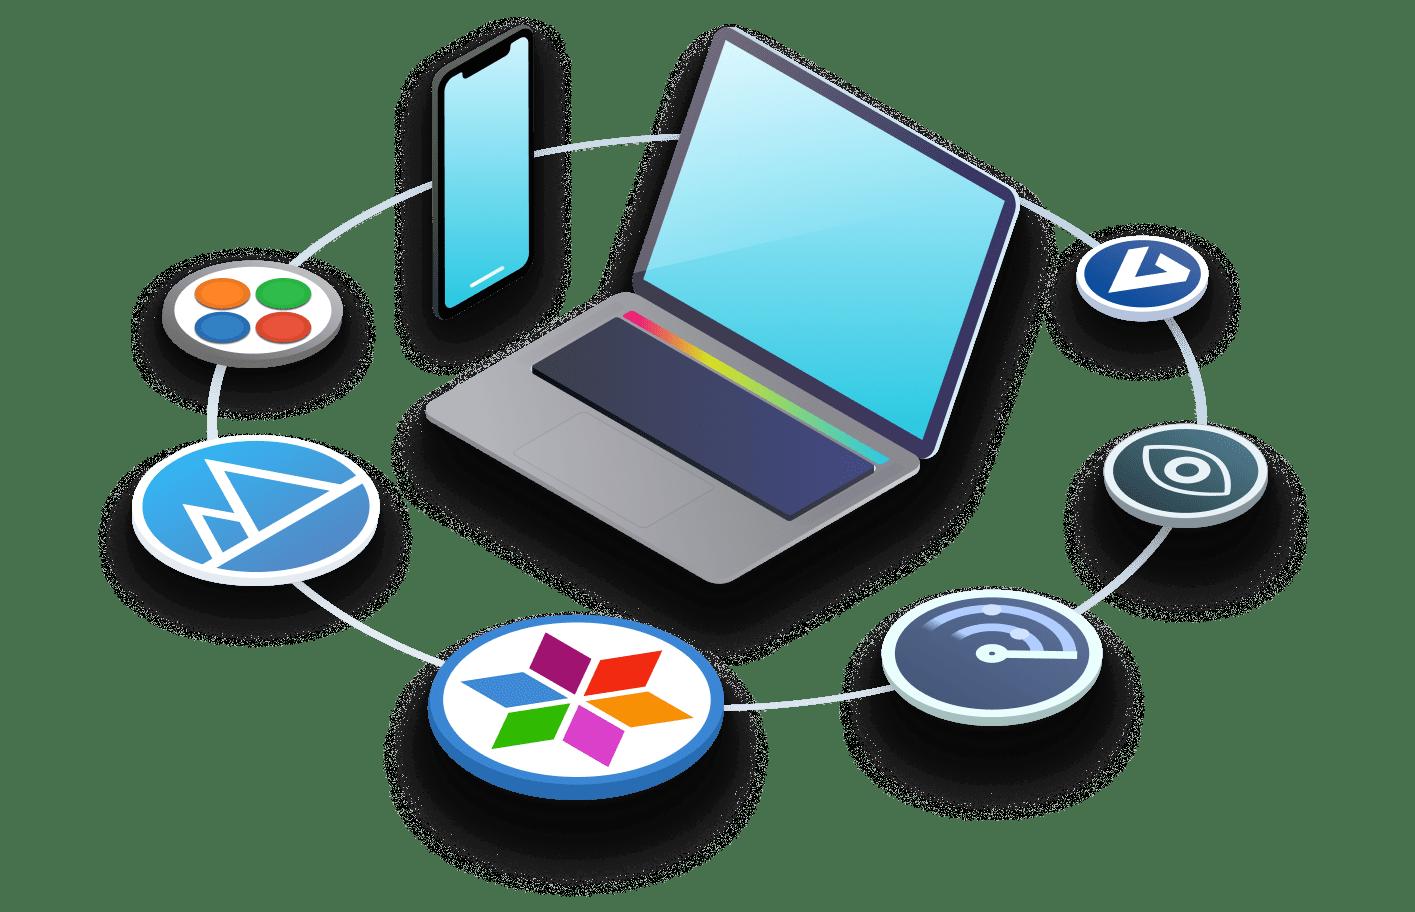 nektony software apps icon